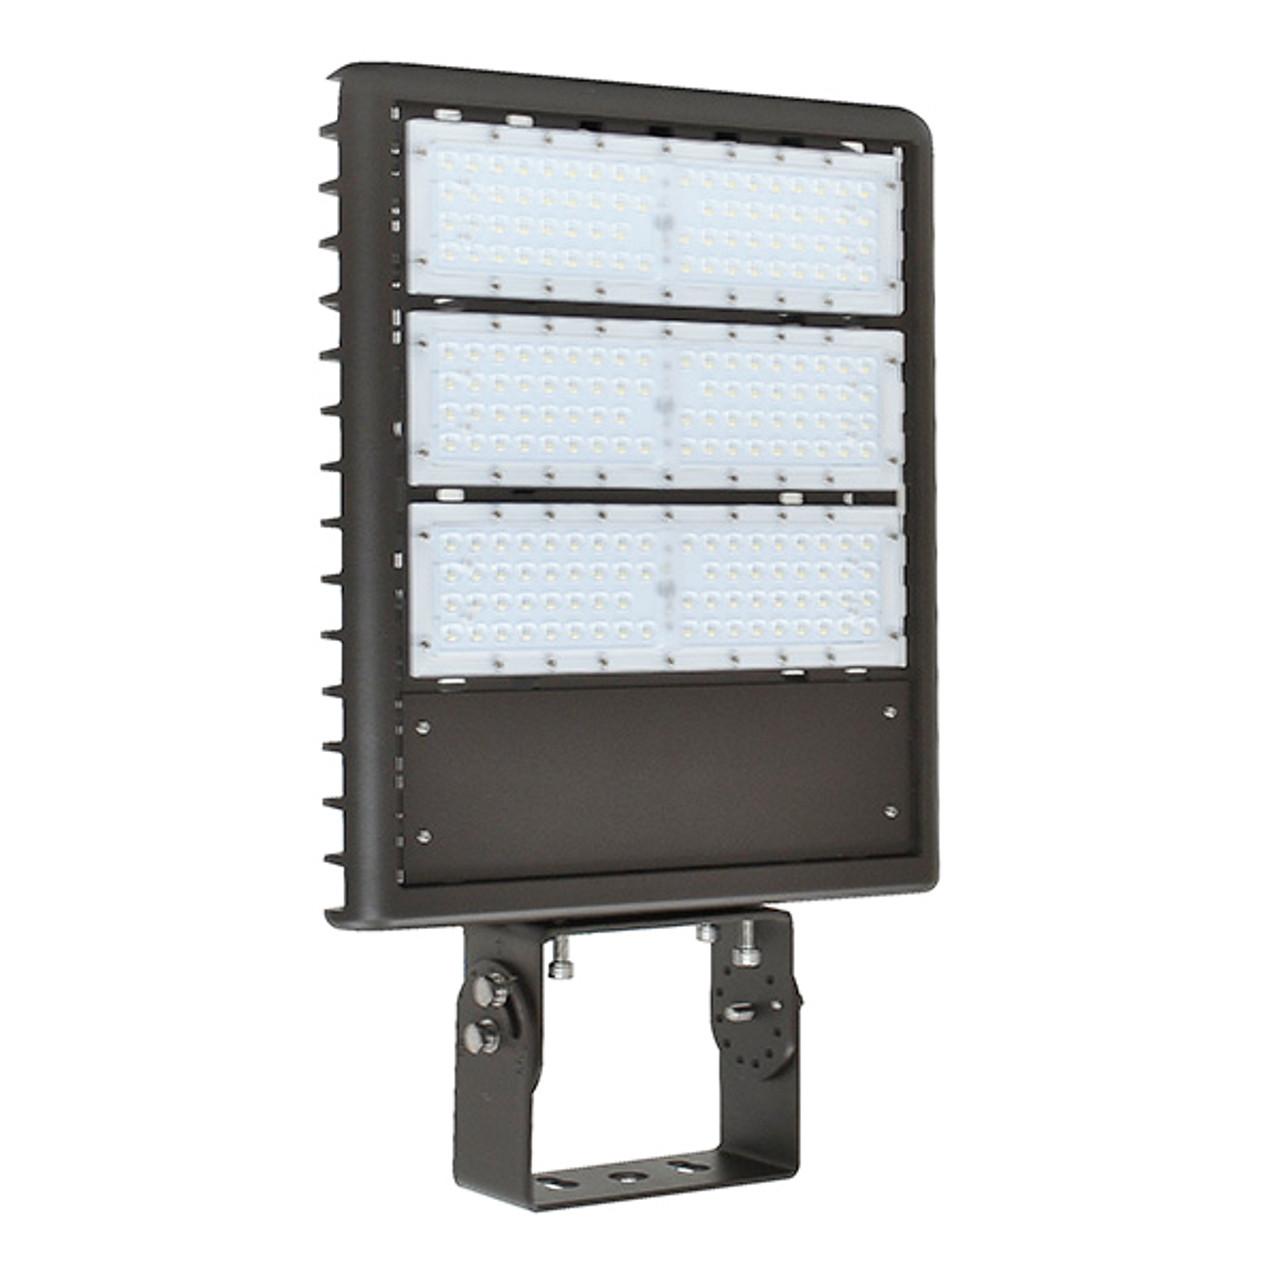 185W LED Shoebox Light  - 600W HPS/MH Equivalent - Gen 3